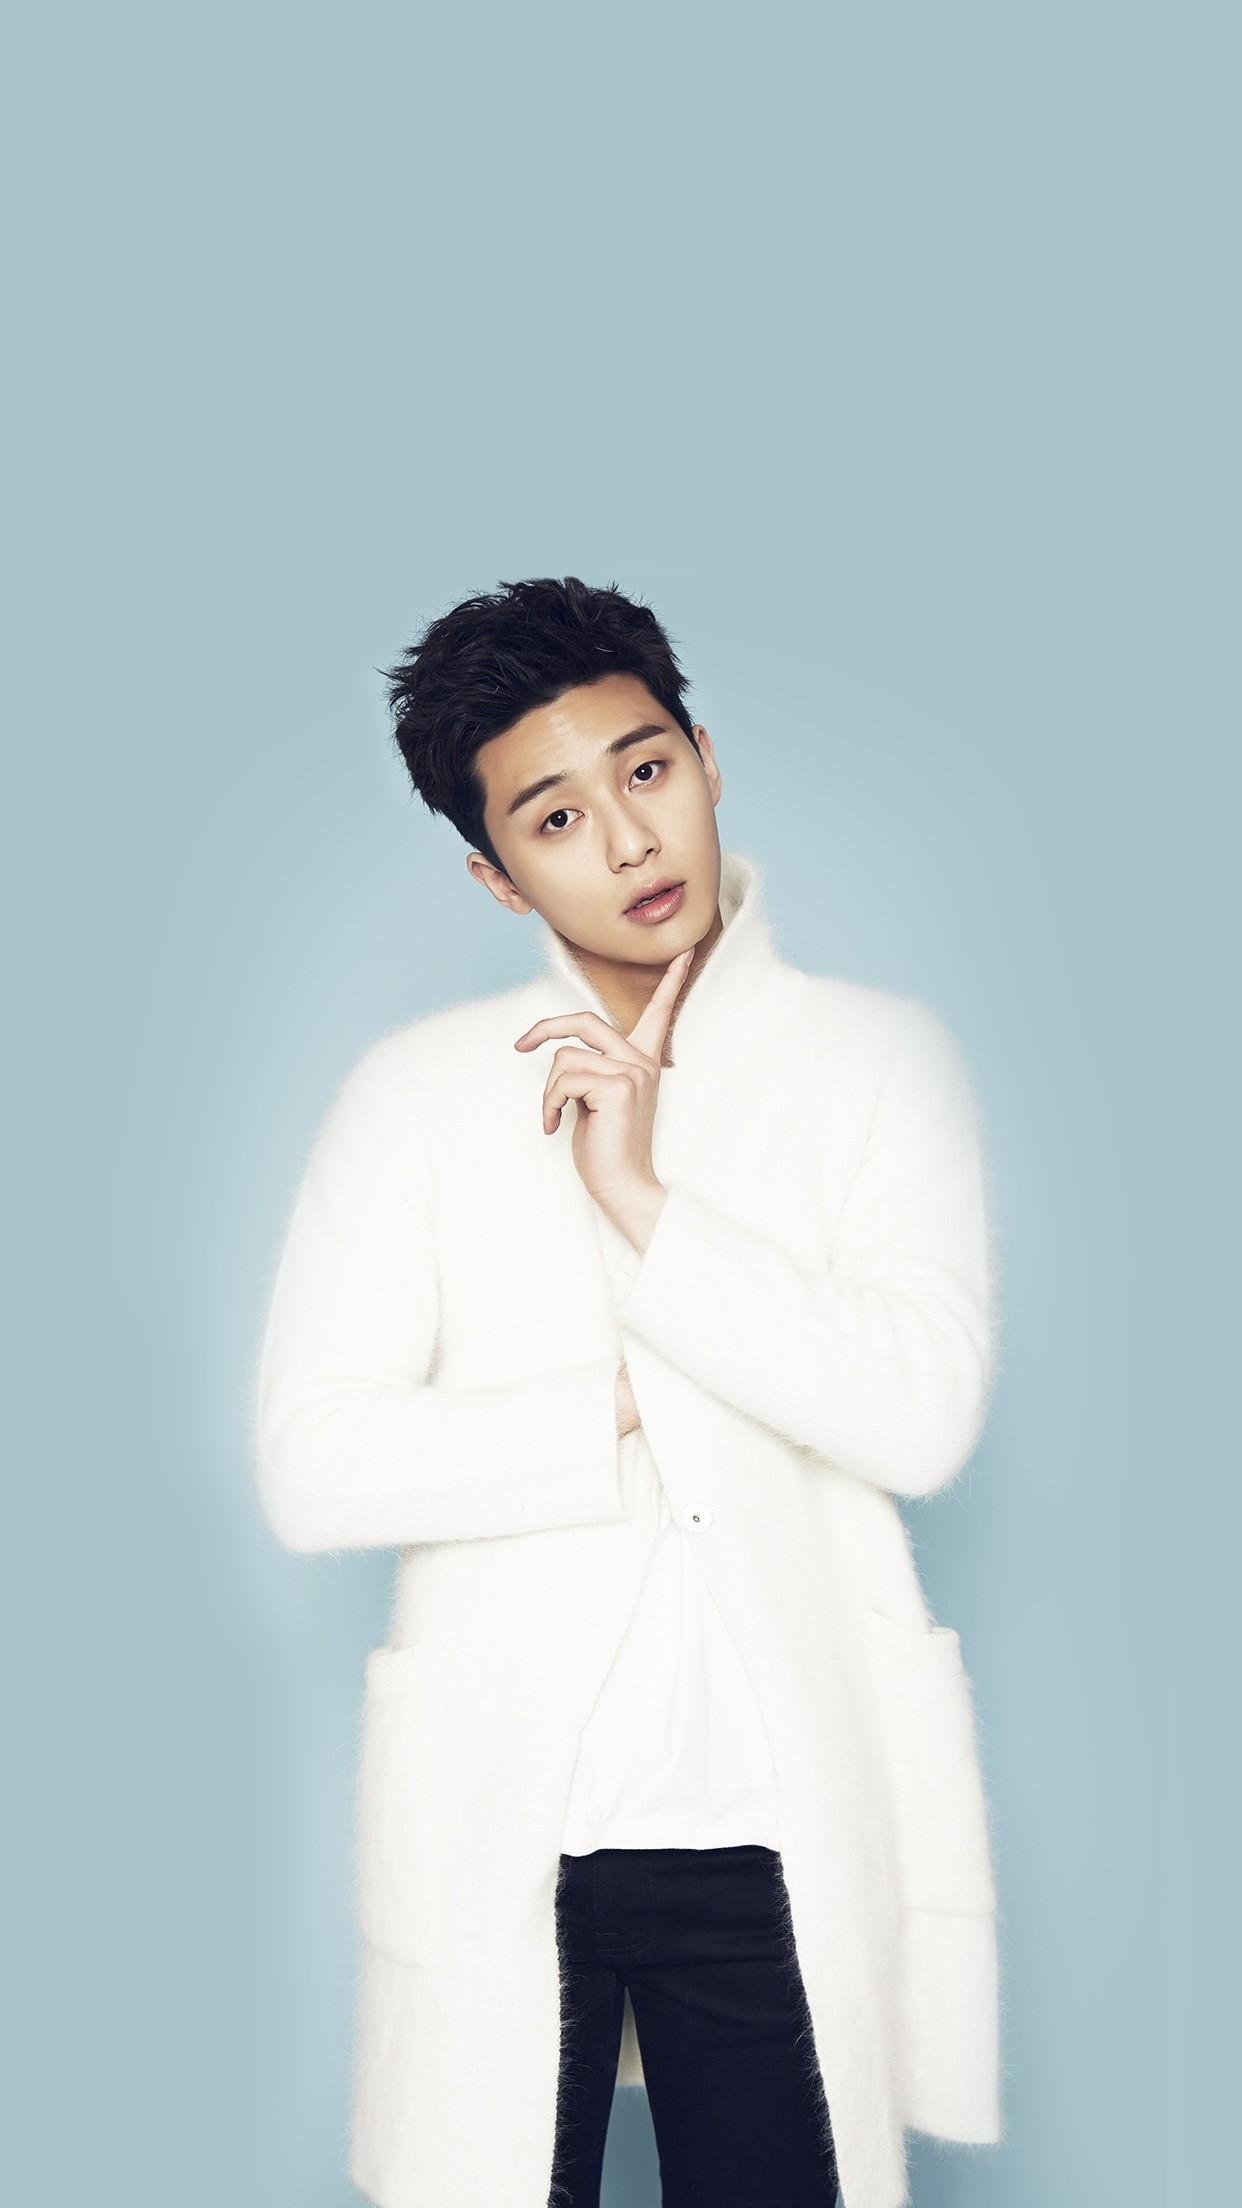 Park Seo Joon Kpop Blue Handsome Cool Guy